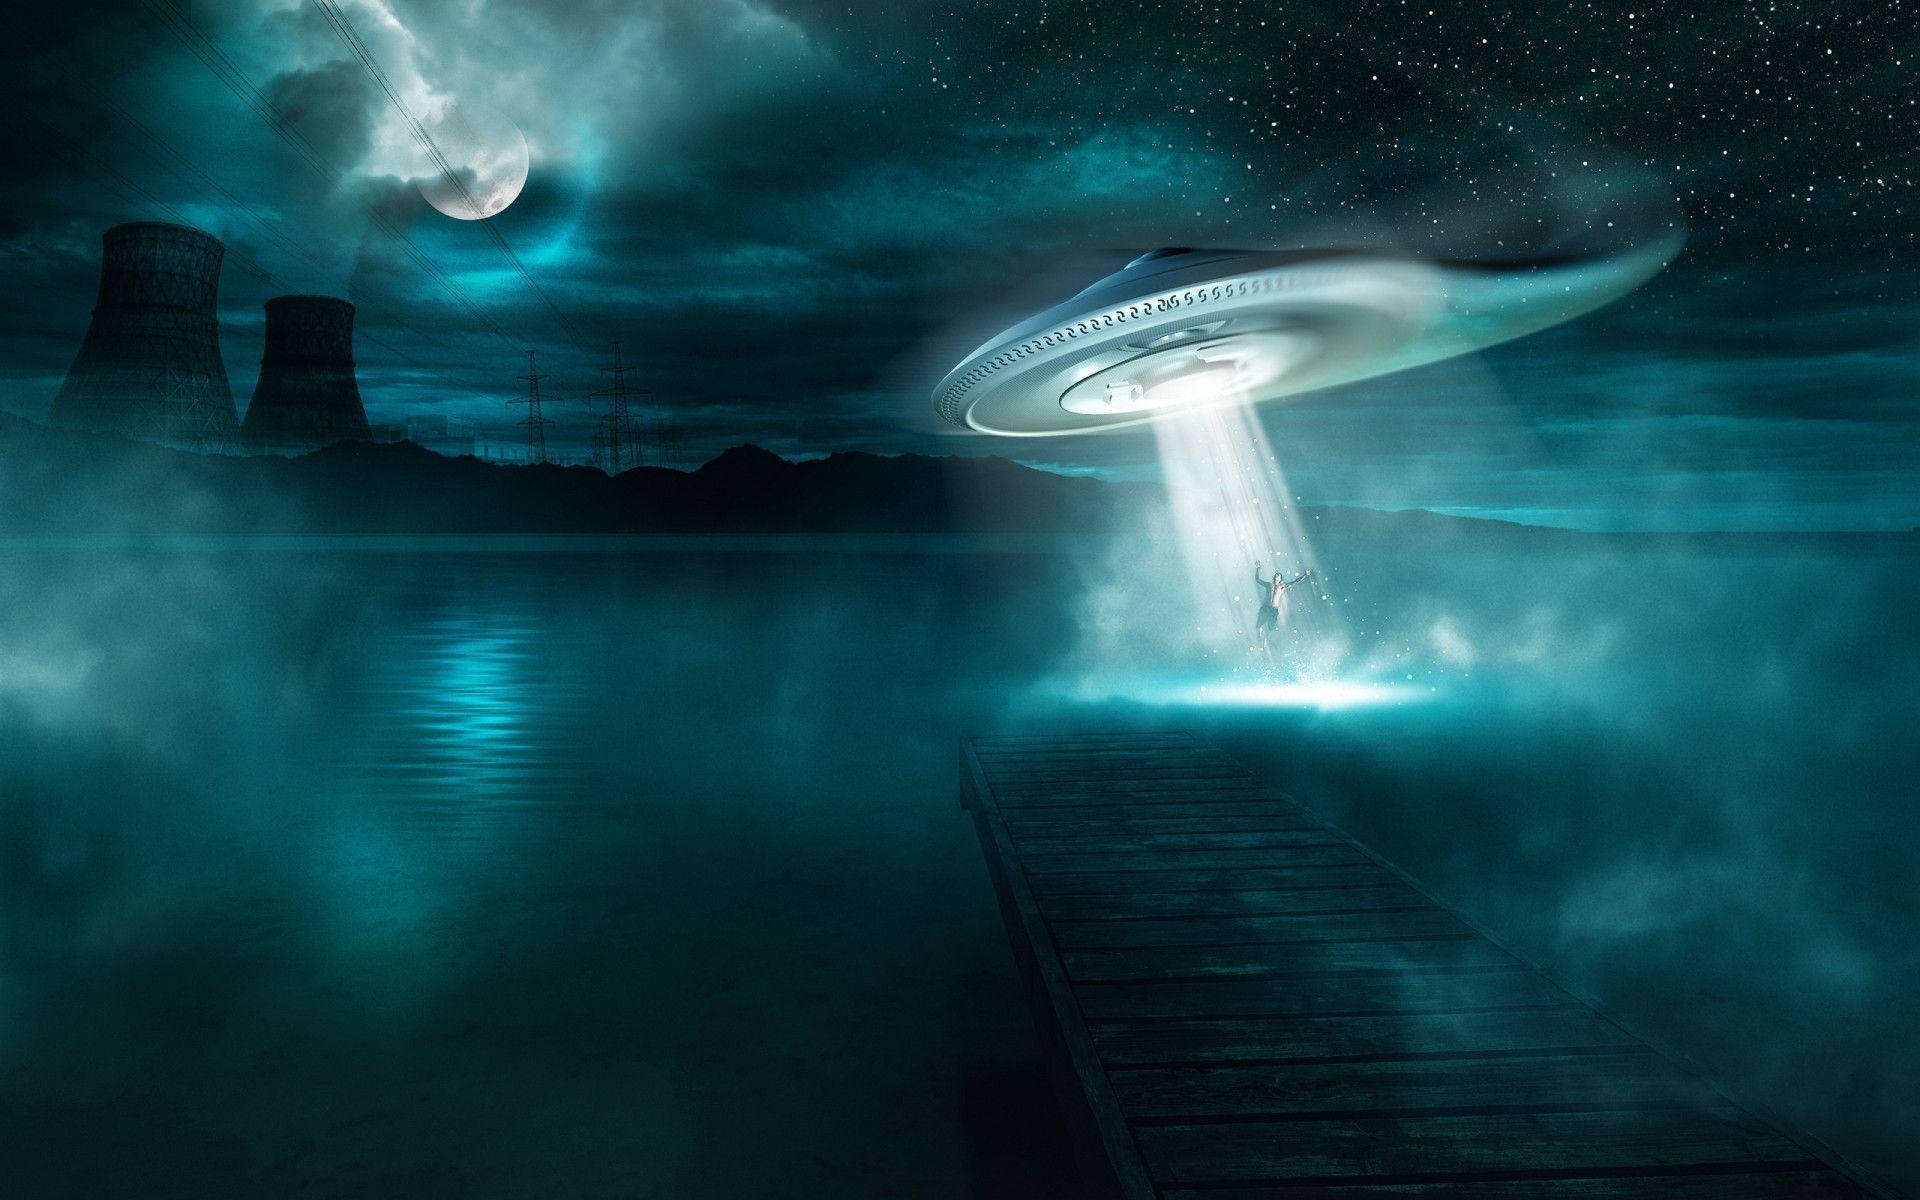 Alien UFO Wallpapers   Top Alien UFO Backgrounds 1920x1200